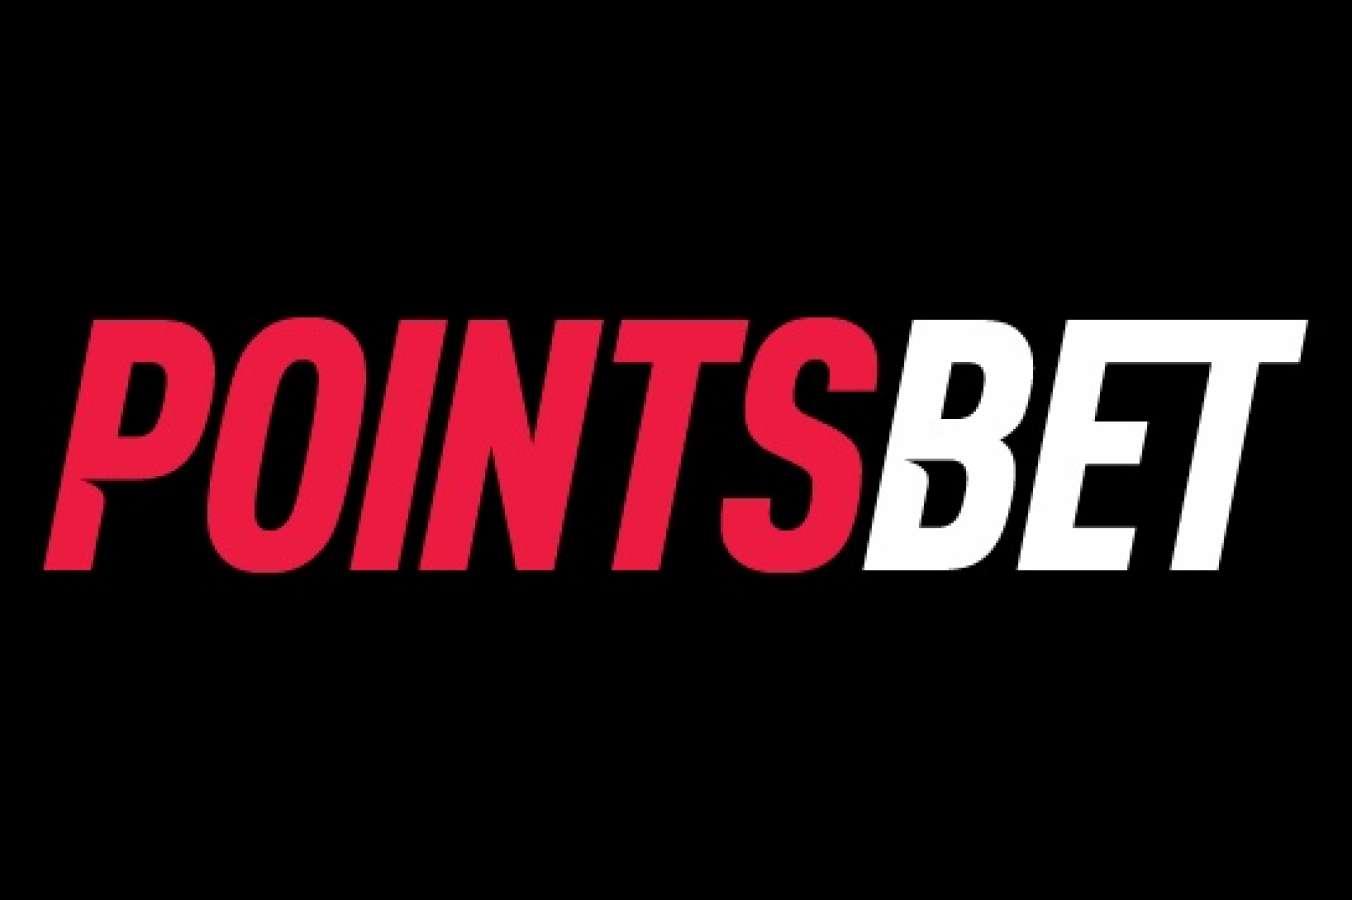 Pointsbet News